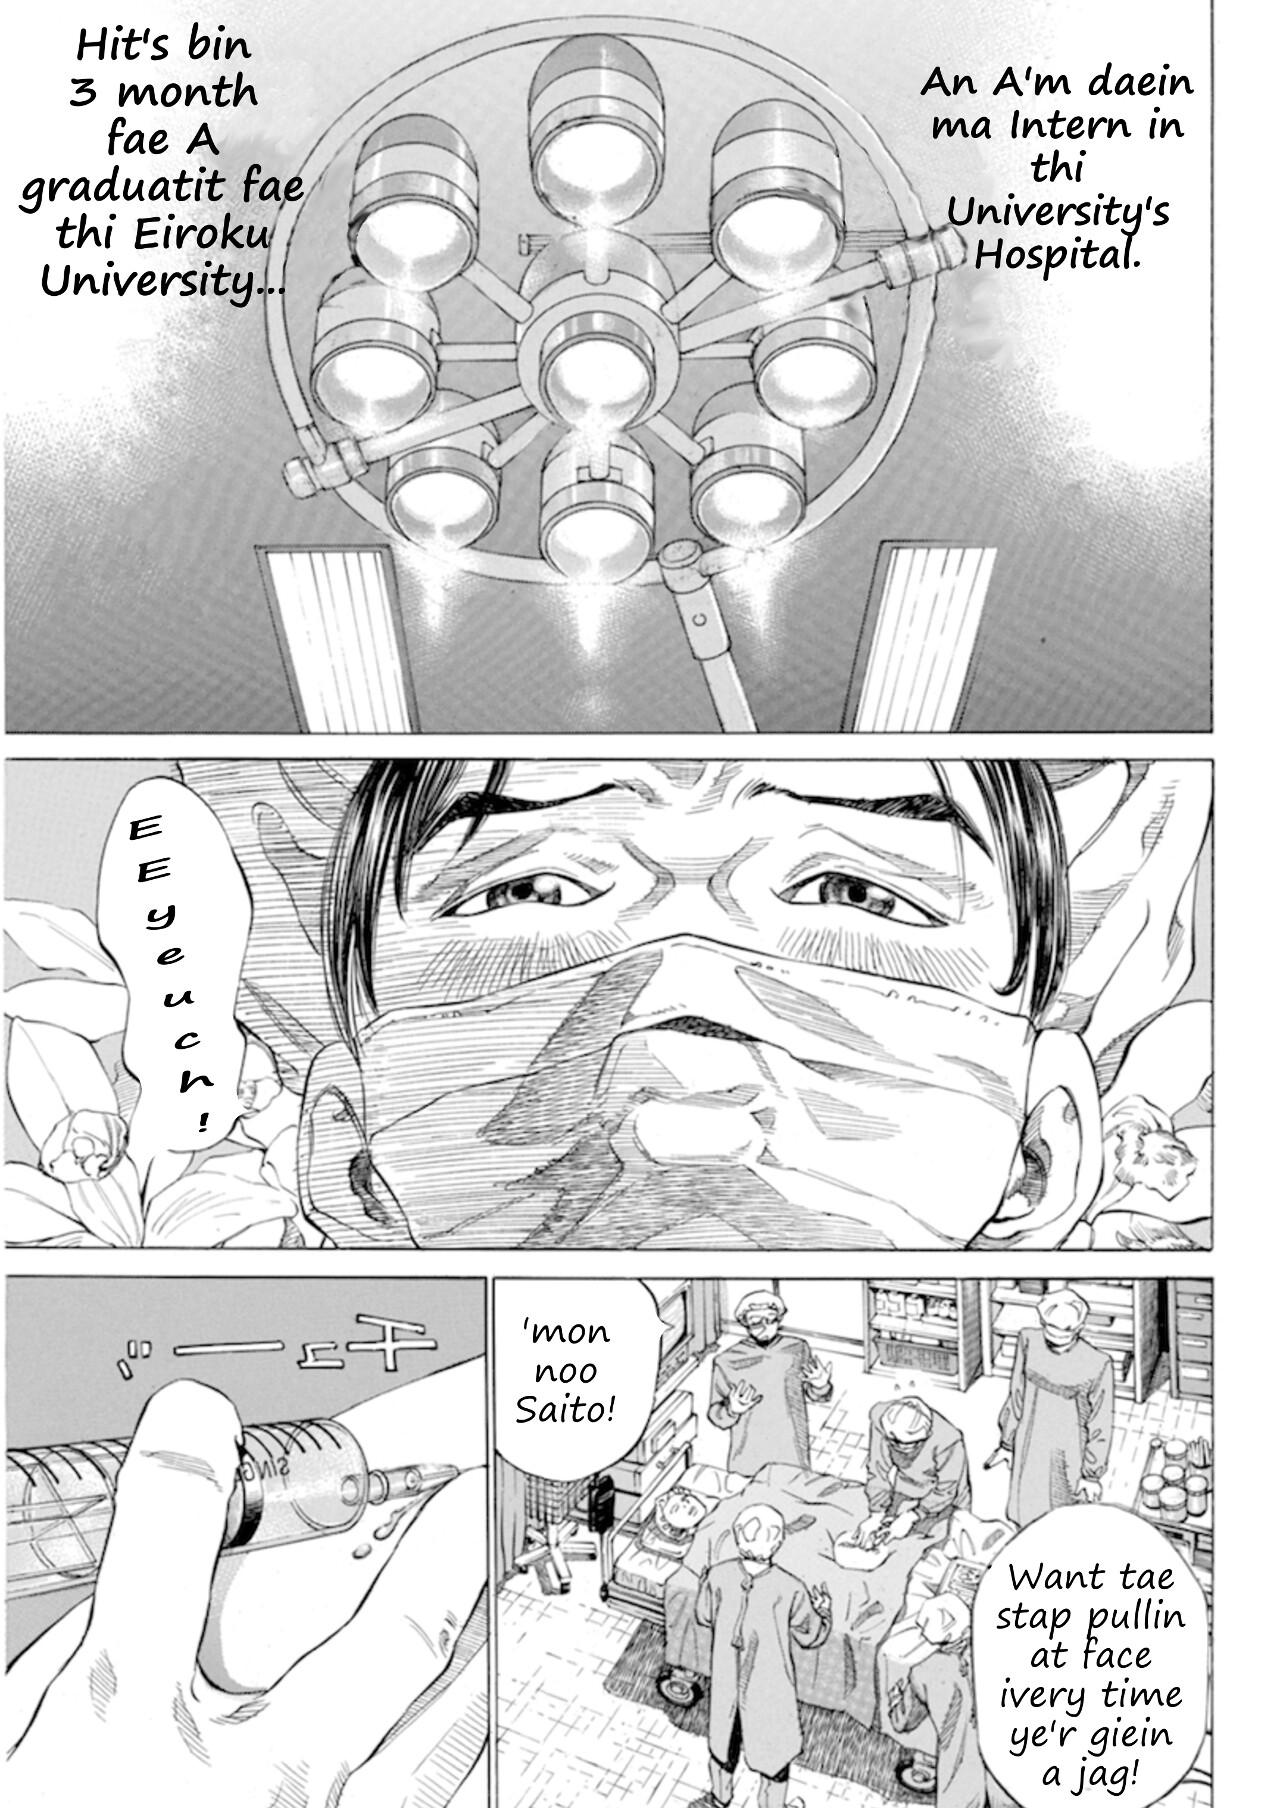 Jock-Dhu-Scots-manga-01-008